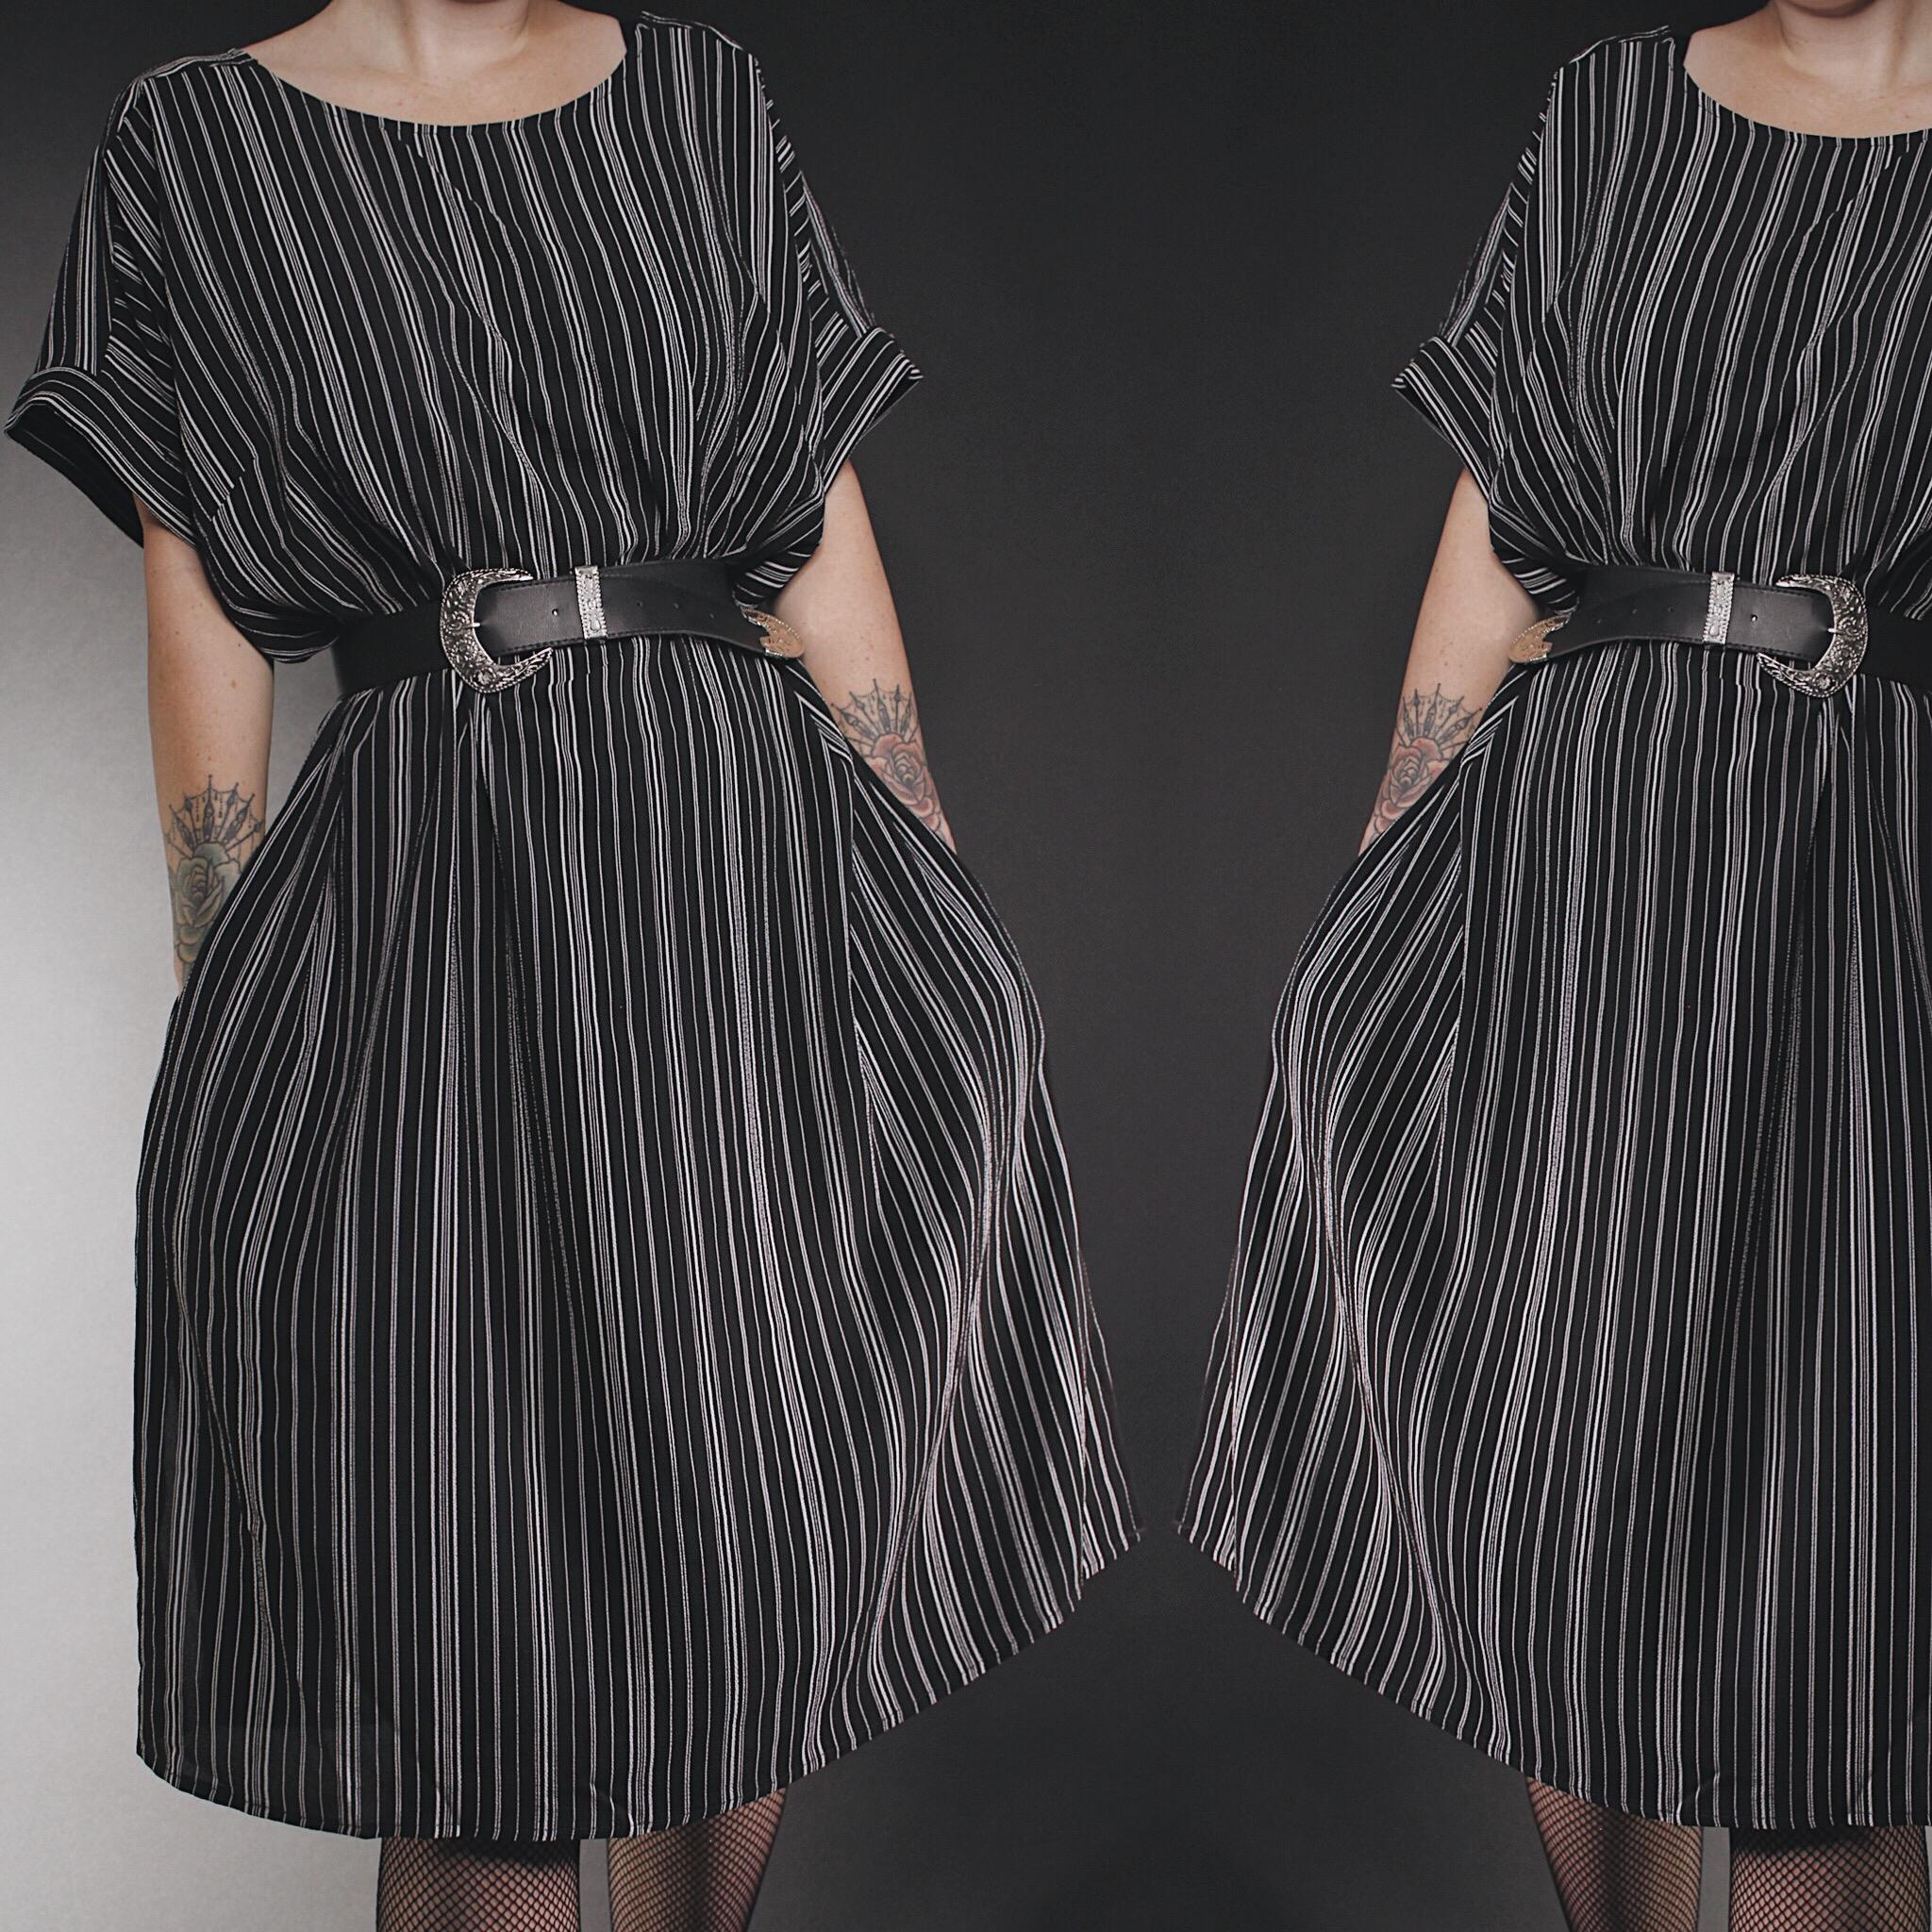 a3cc07e9371 RESERVED FOR RACHEL S. - Vintage 80s Skellington Midi Dress · Last ...